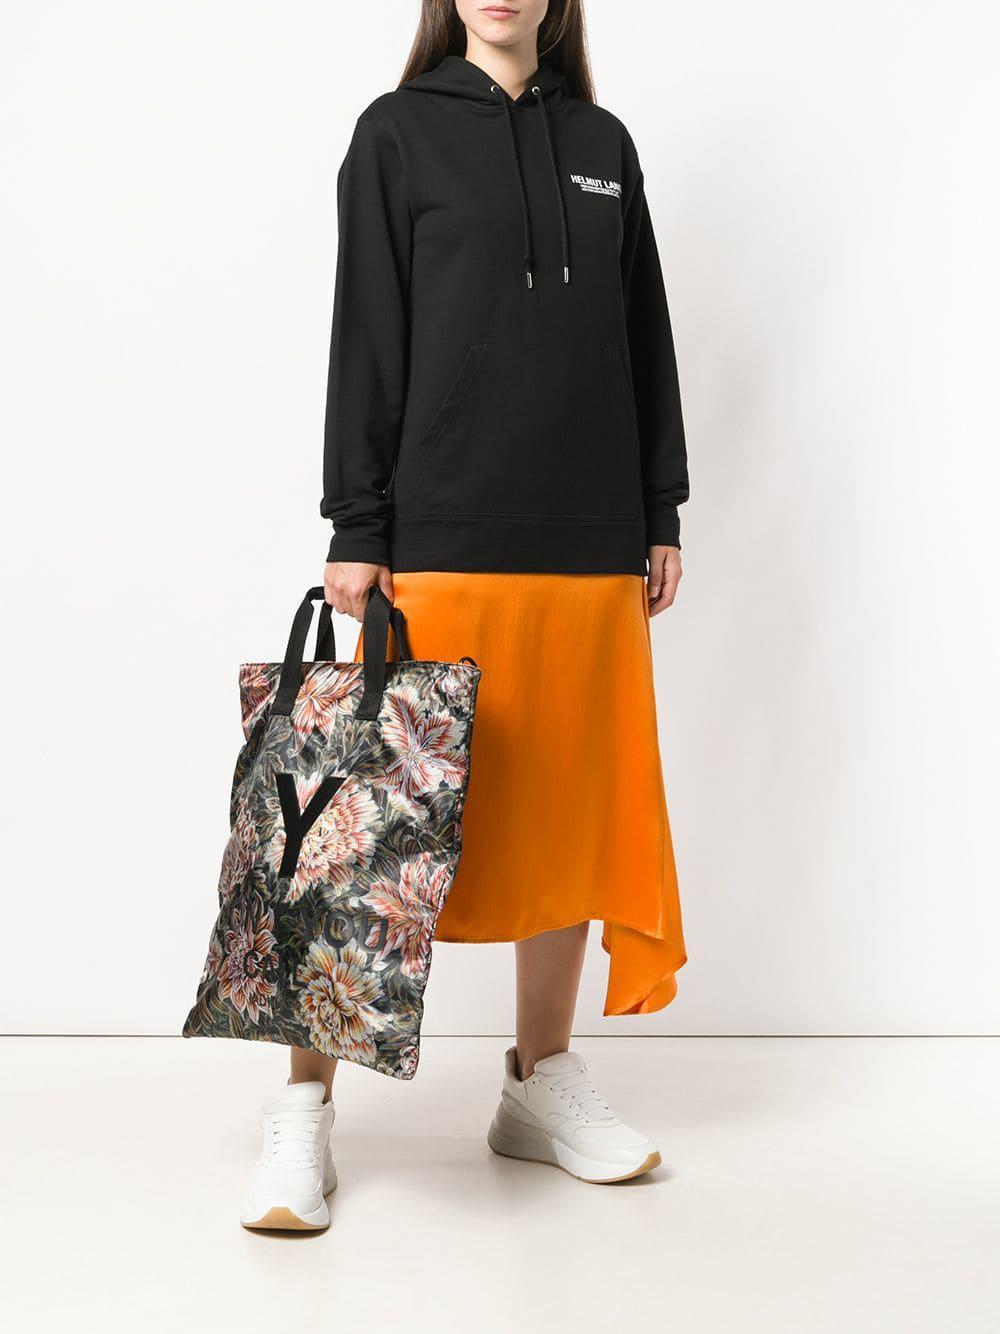 Lyst - Y-3 Rectangular Tote Bag in Black 7e9d5f7921